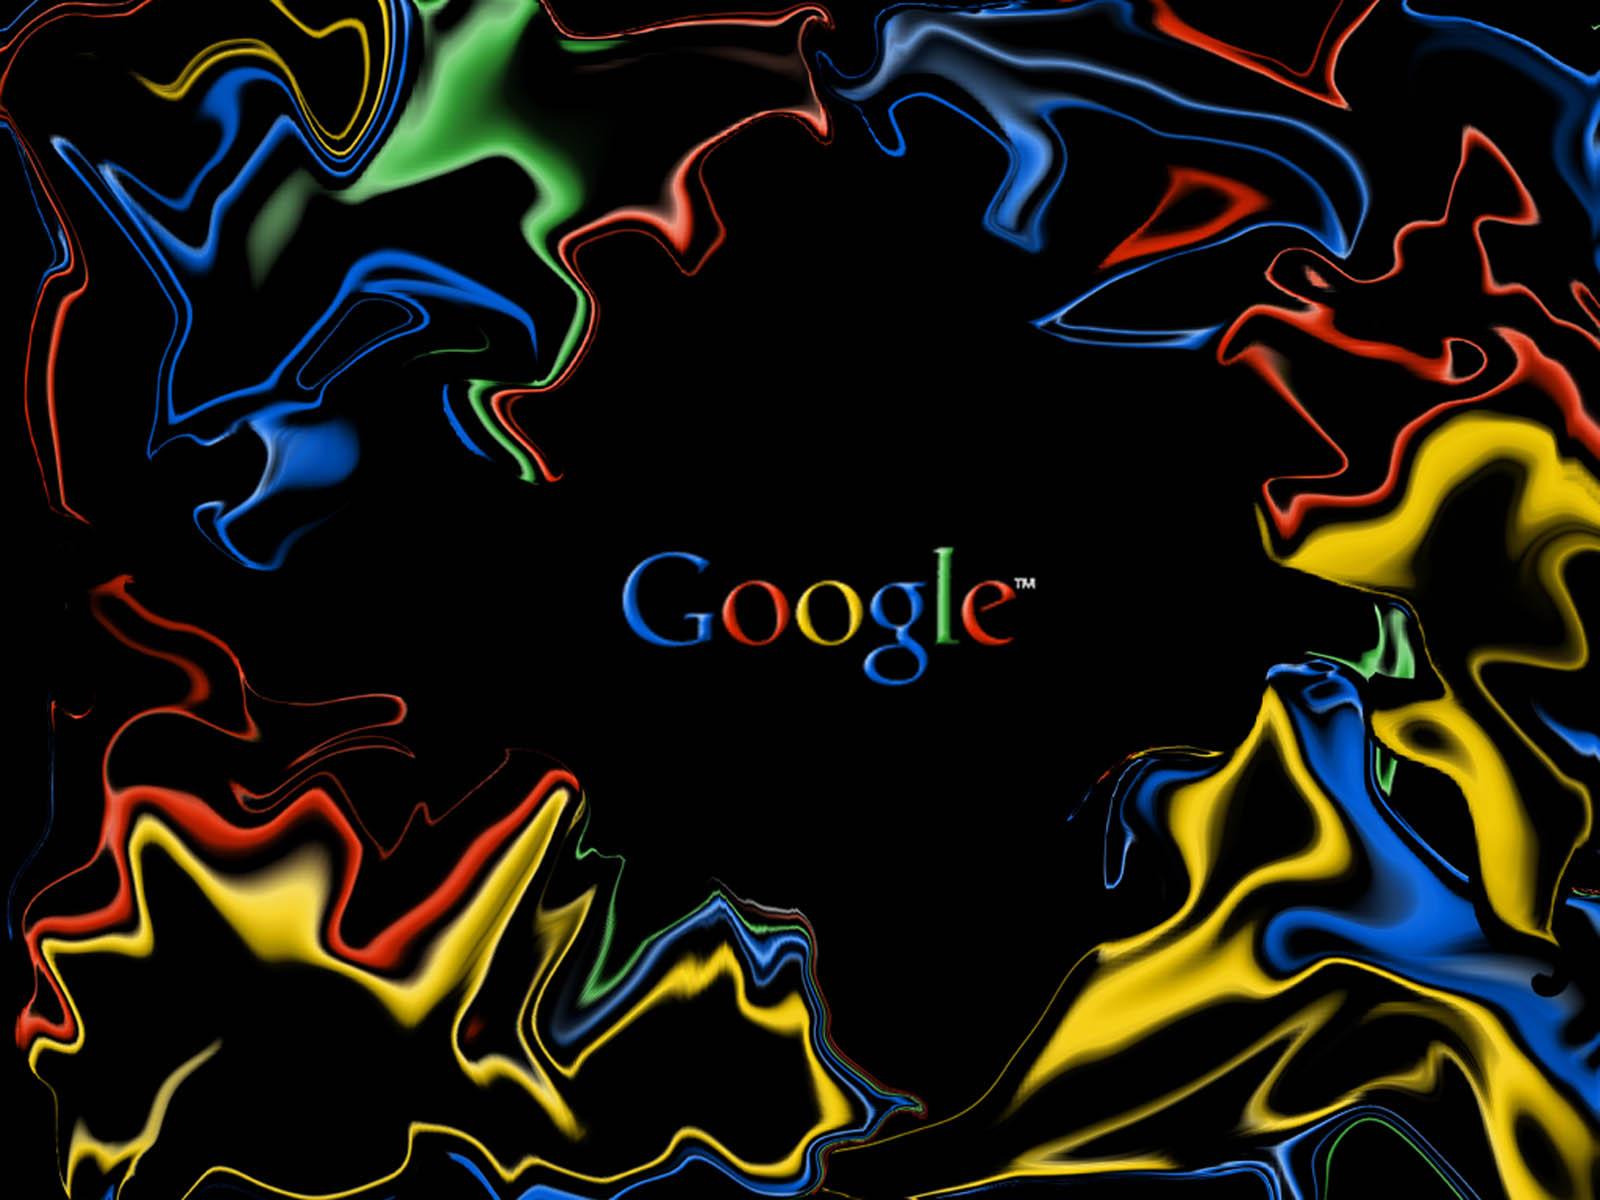 google wallpaper 1 1600x1200